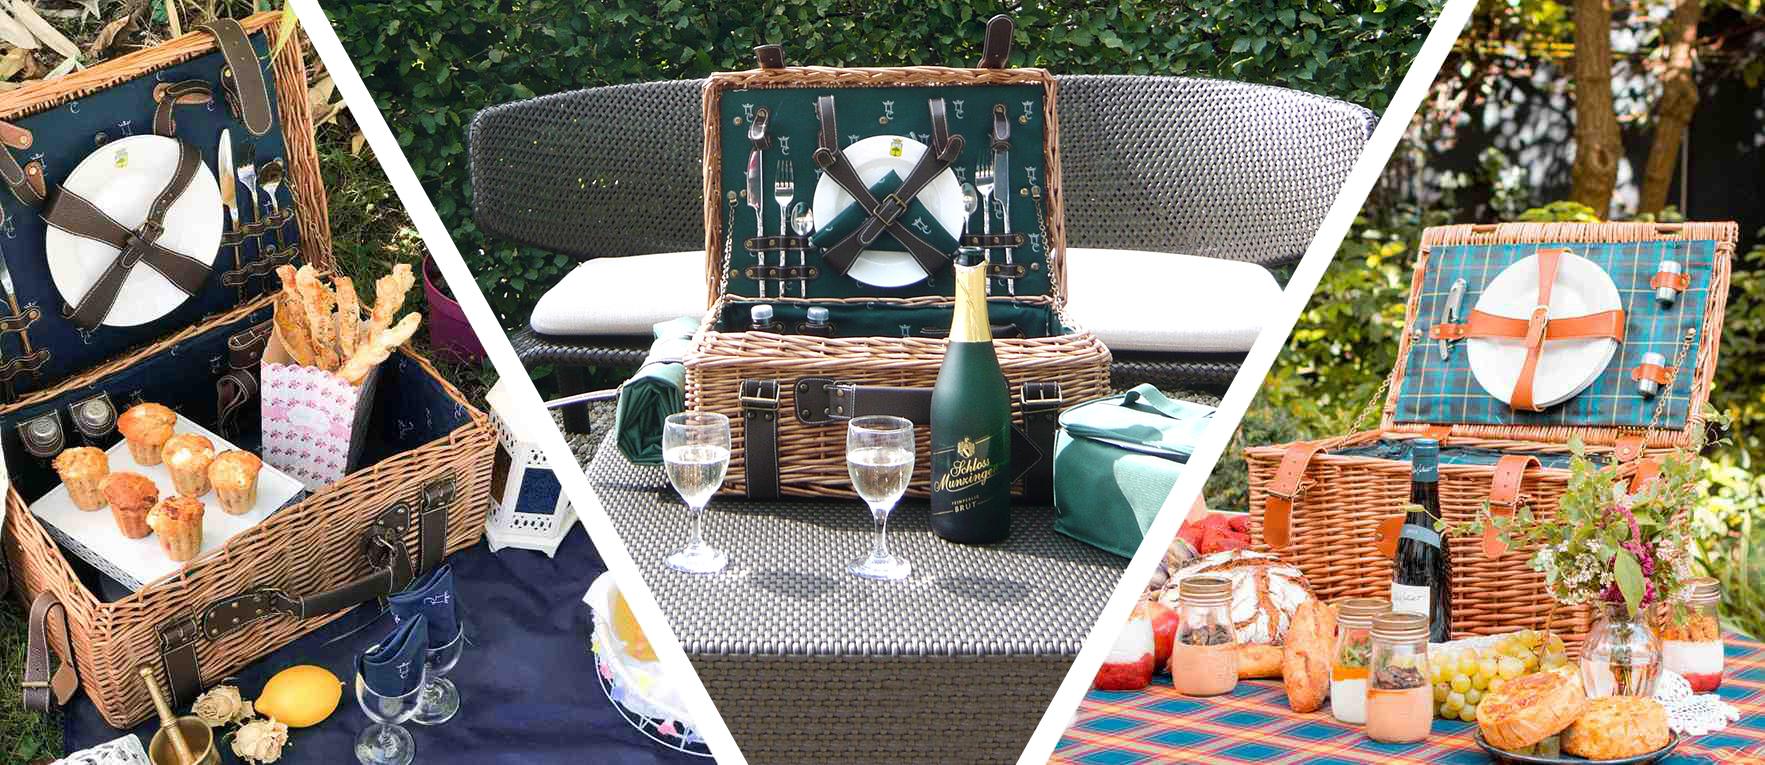 Leren picknickmanden Trianon - Paris